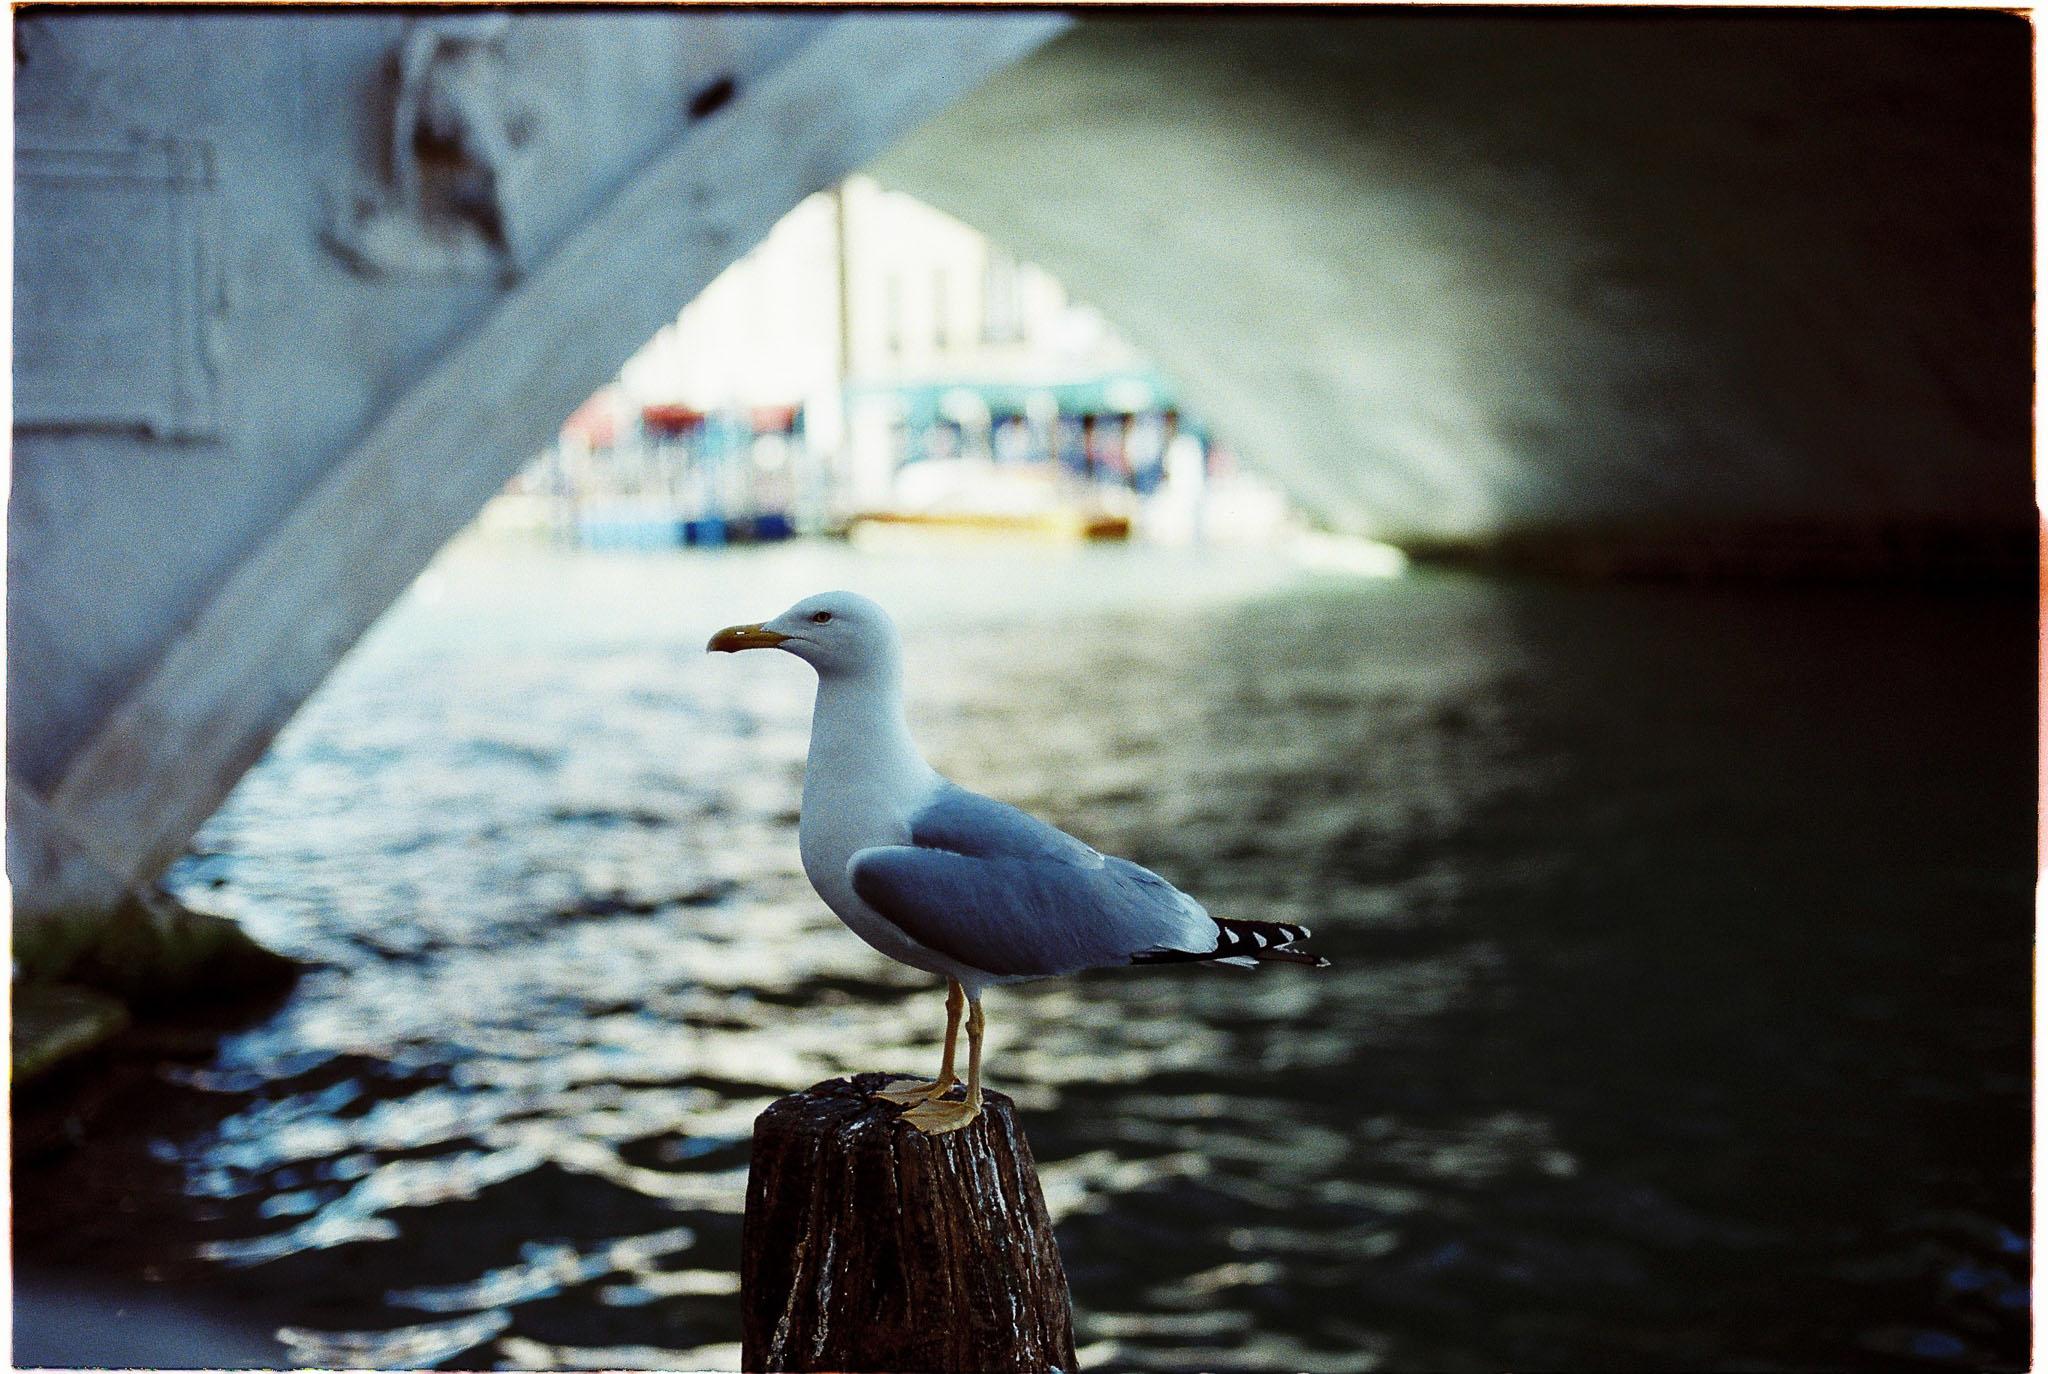 Gull in Venice Grand canal expired film agfa vista 100